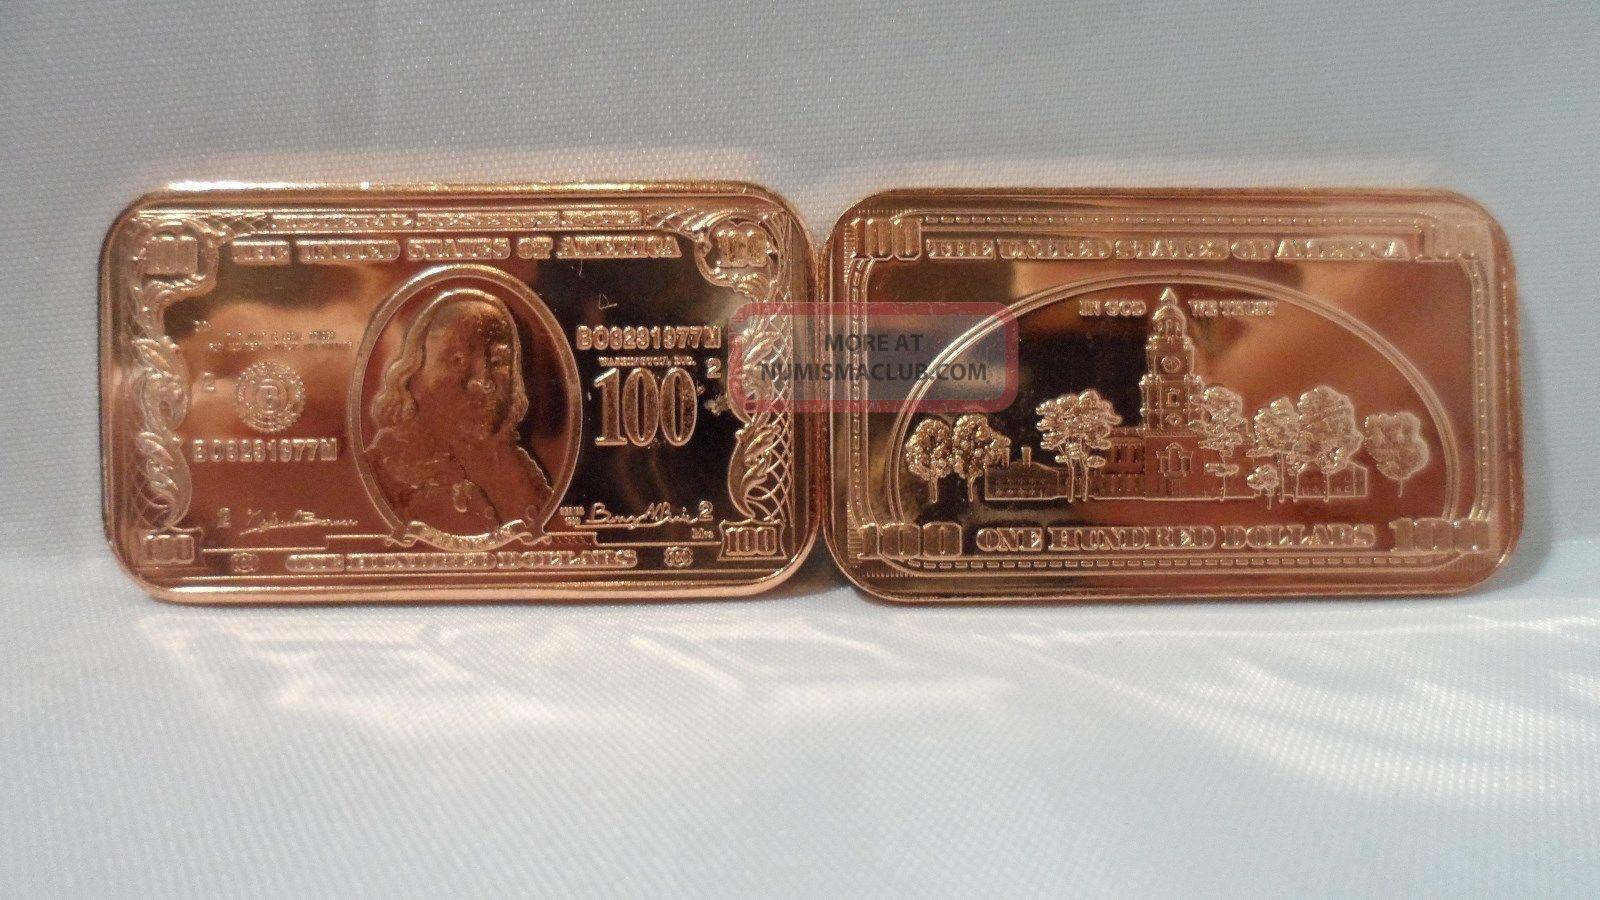 1 Oz 100 Ben Franklin Bank Note Ingot 999 Fine Copper